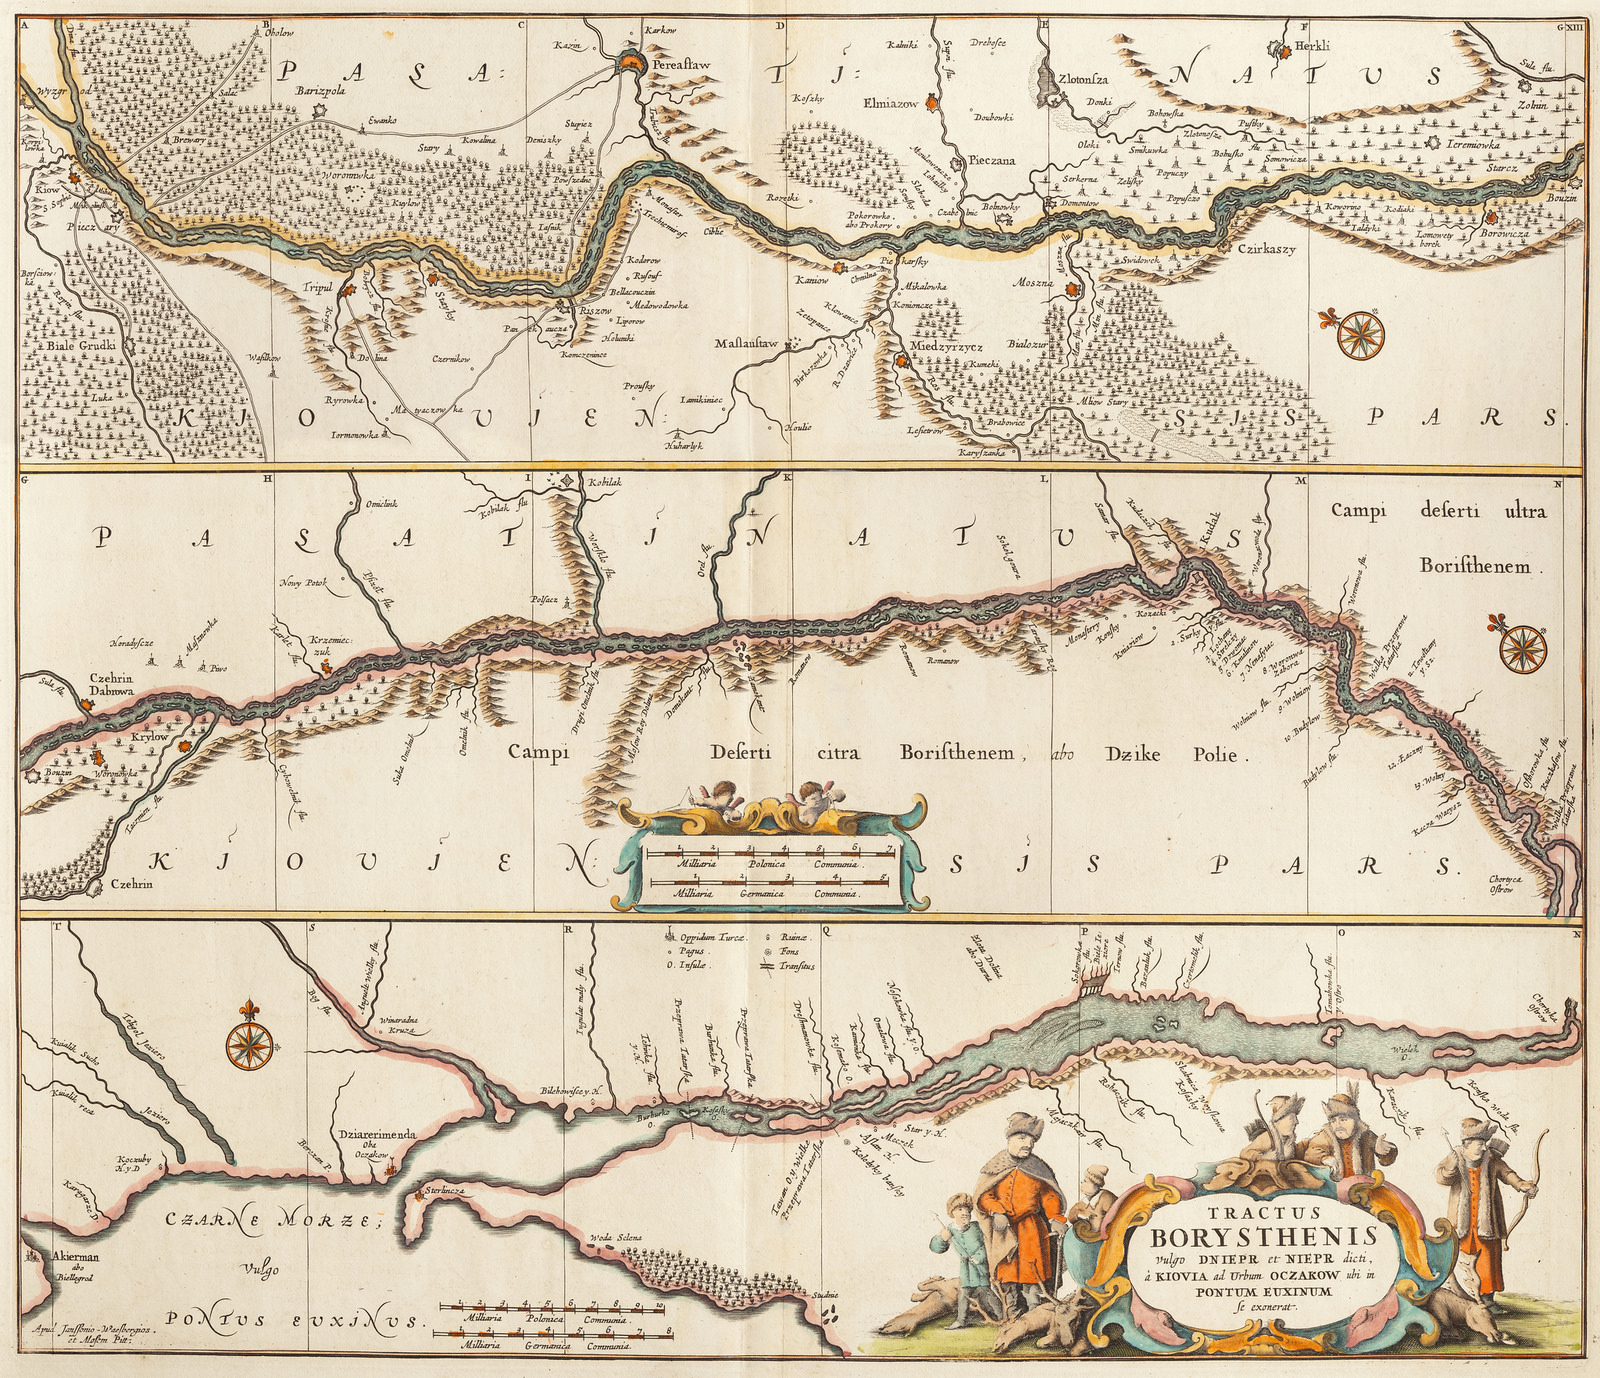 Tractus Borysthenis 1680